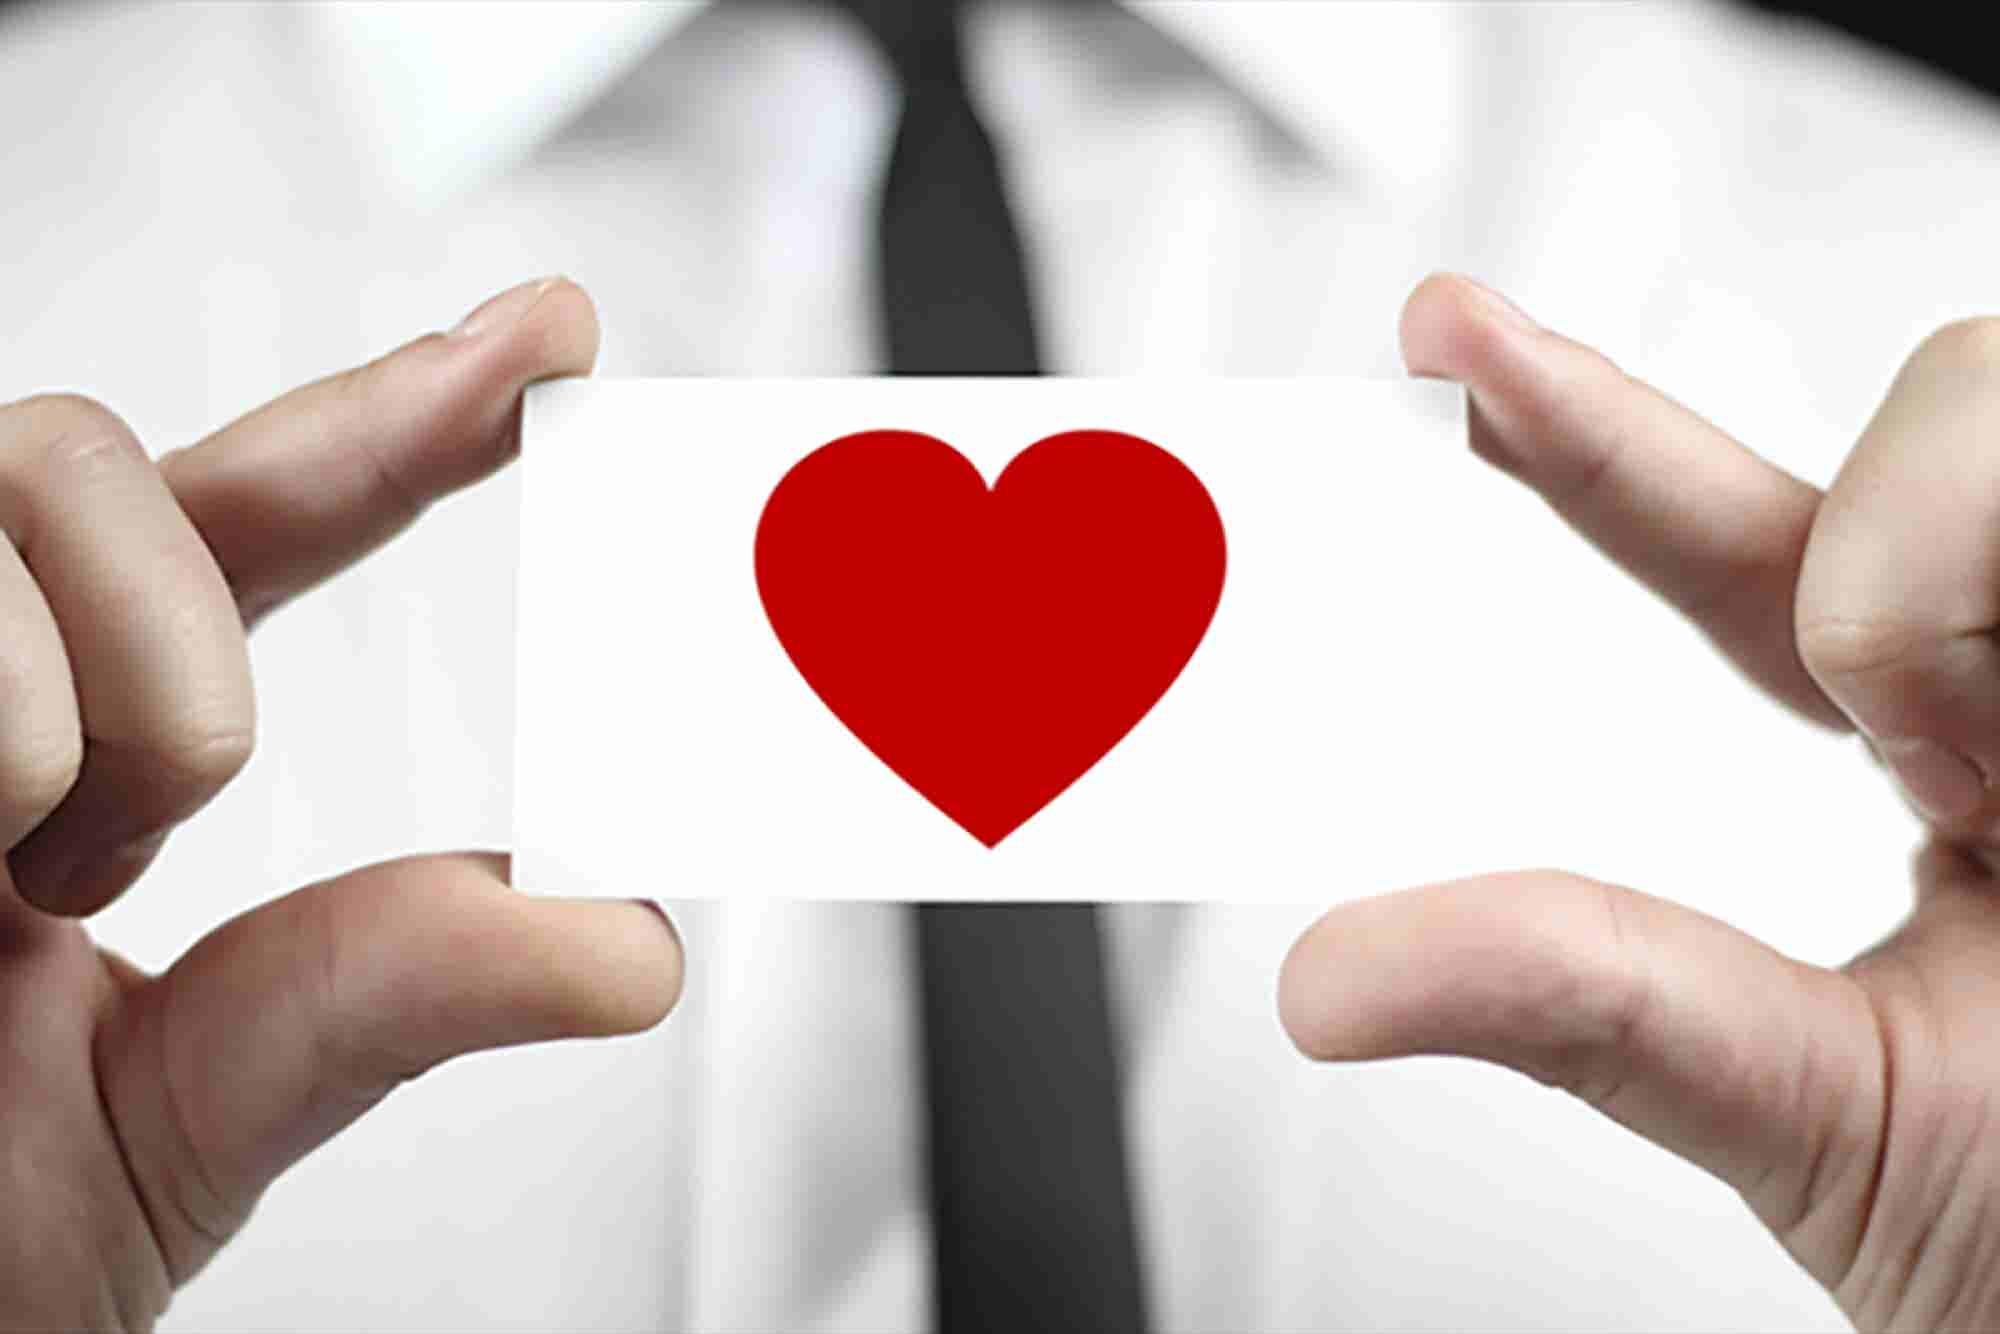 5 herramientas no académicas útiles para tu negocio